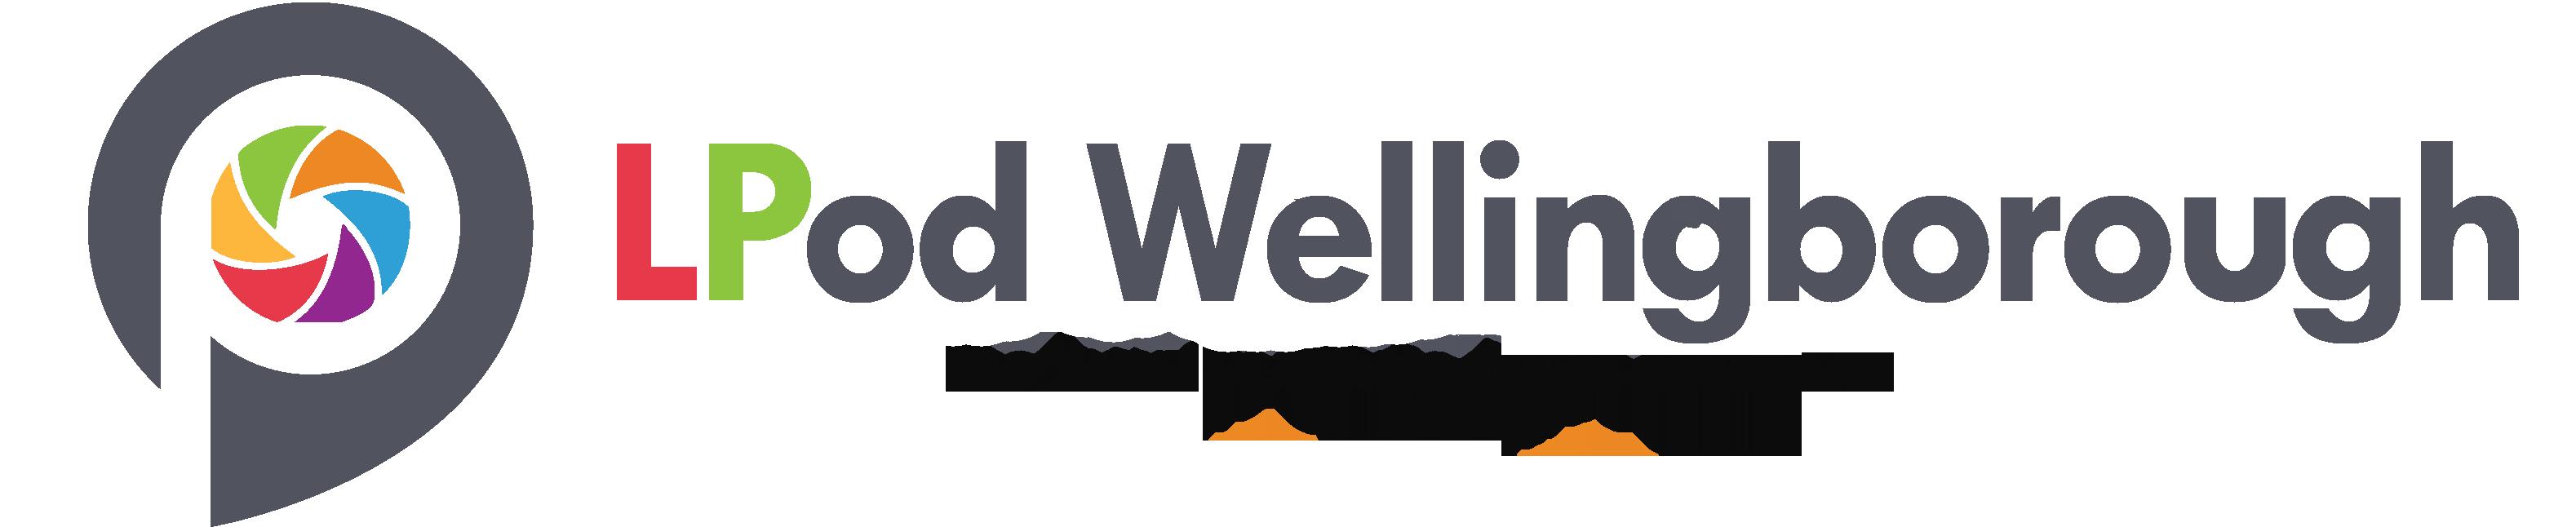 intensive driving courses in Wellingborough